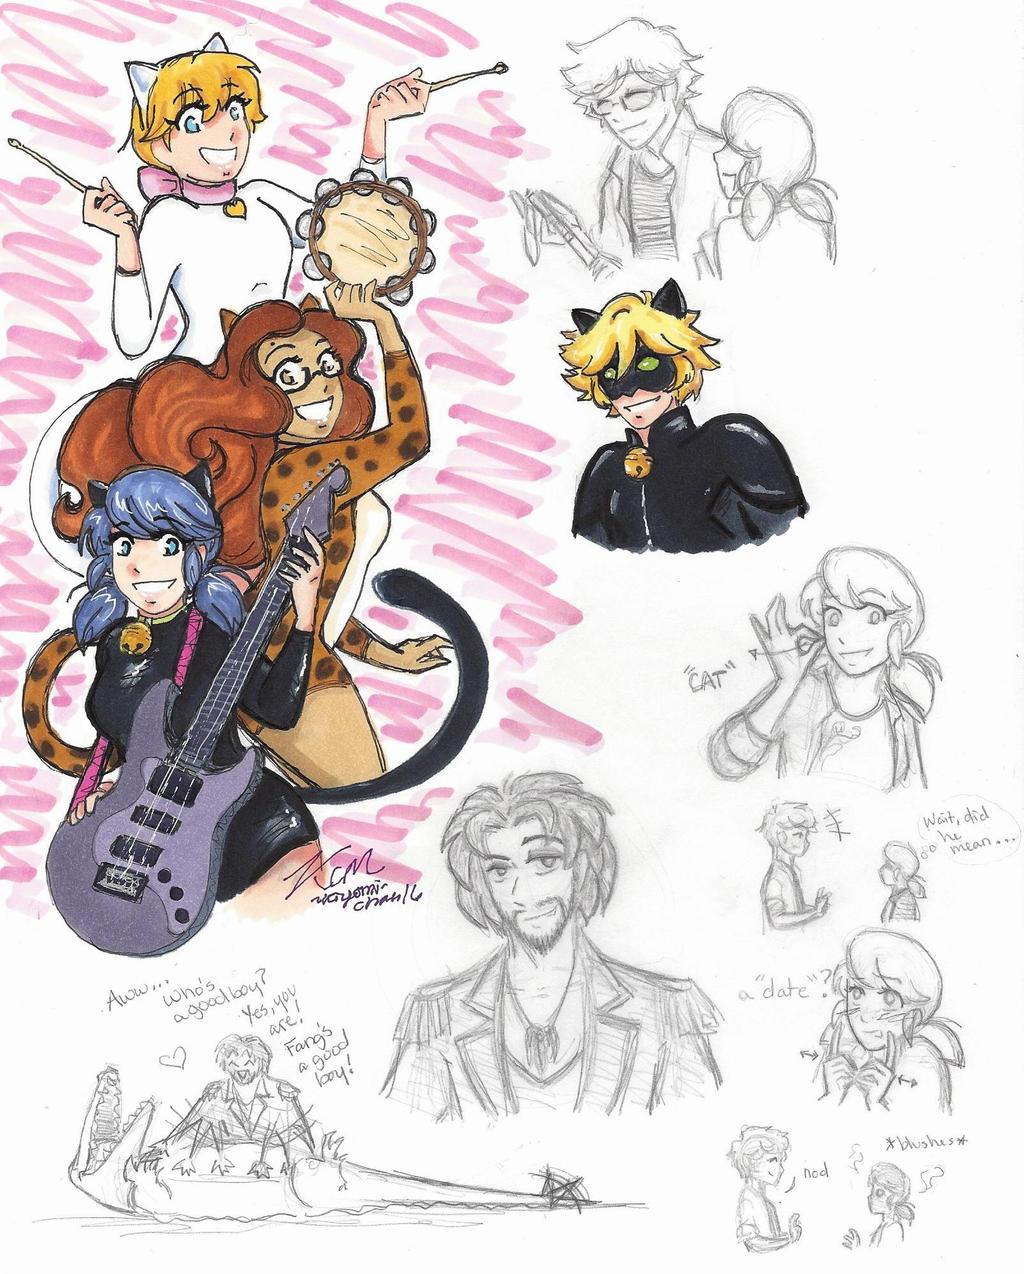 Miraculous Ladybug sketches 3 by Kiyomi-chan16 on DeviantArt